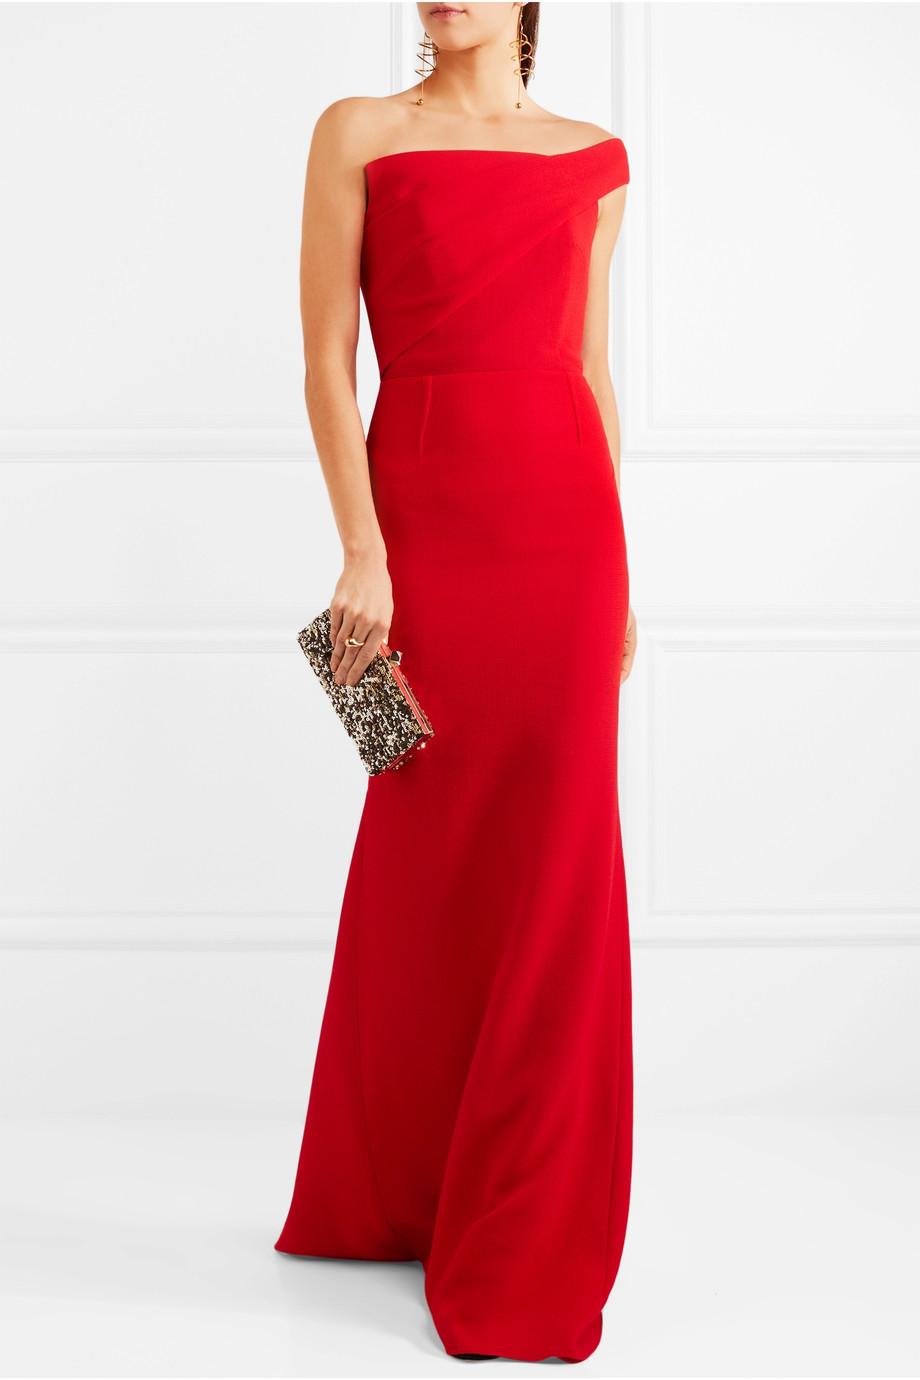 Vestito da sera lungo rosso Roland Mouret